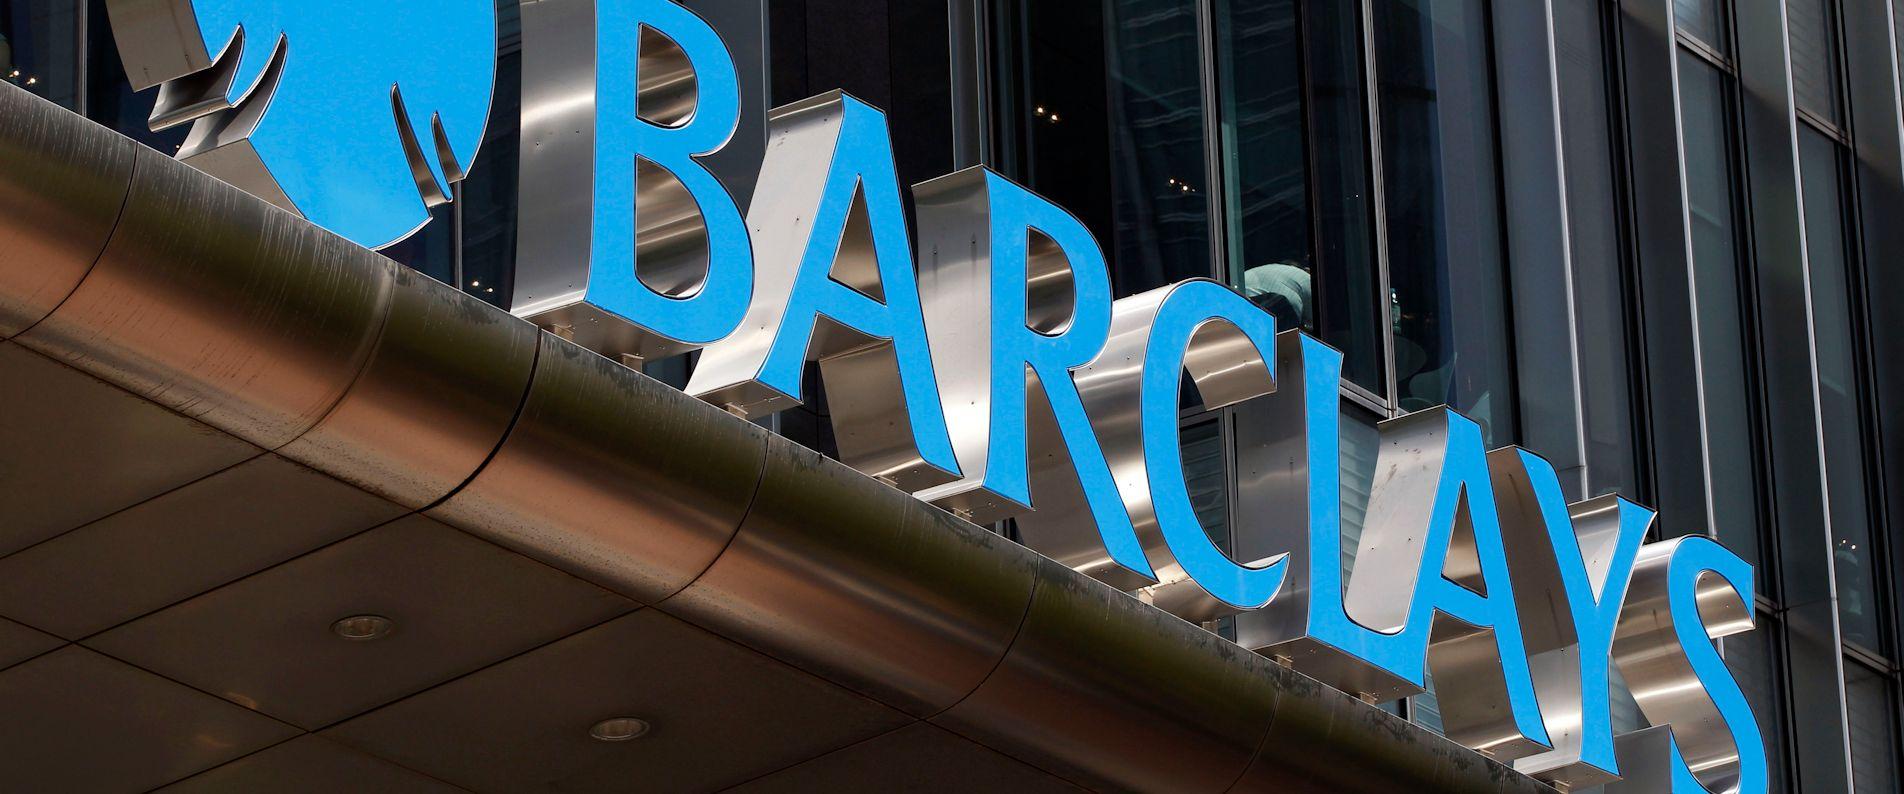 BC In Focus: Barclays Bank | News | Wigan Warriors